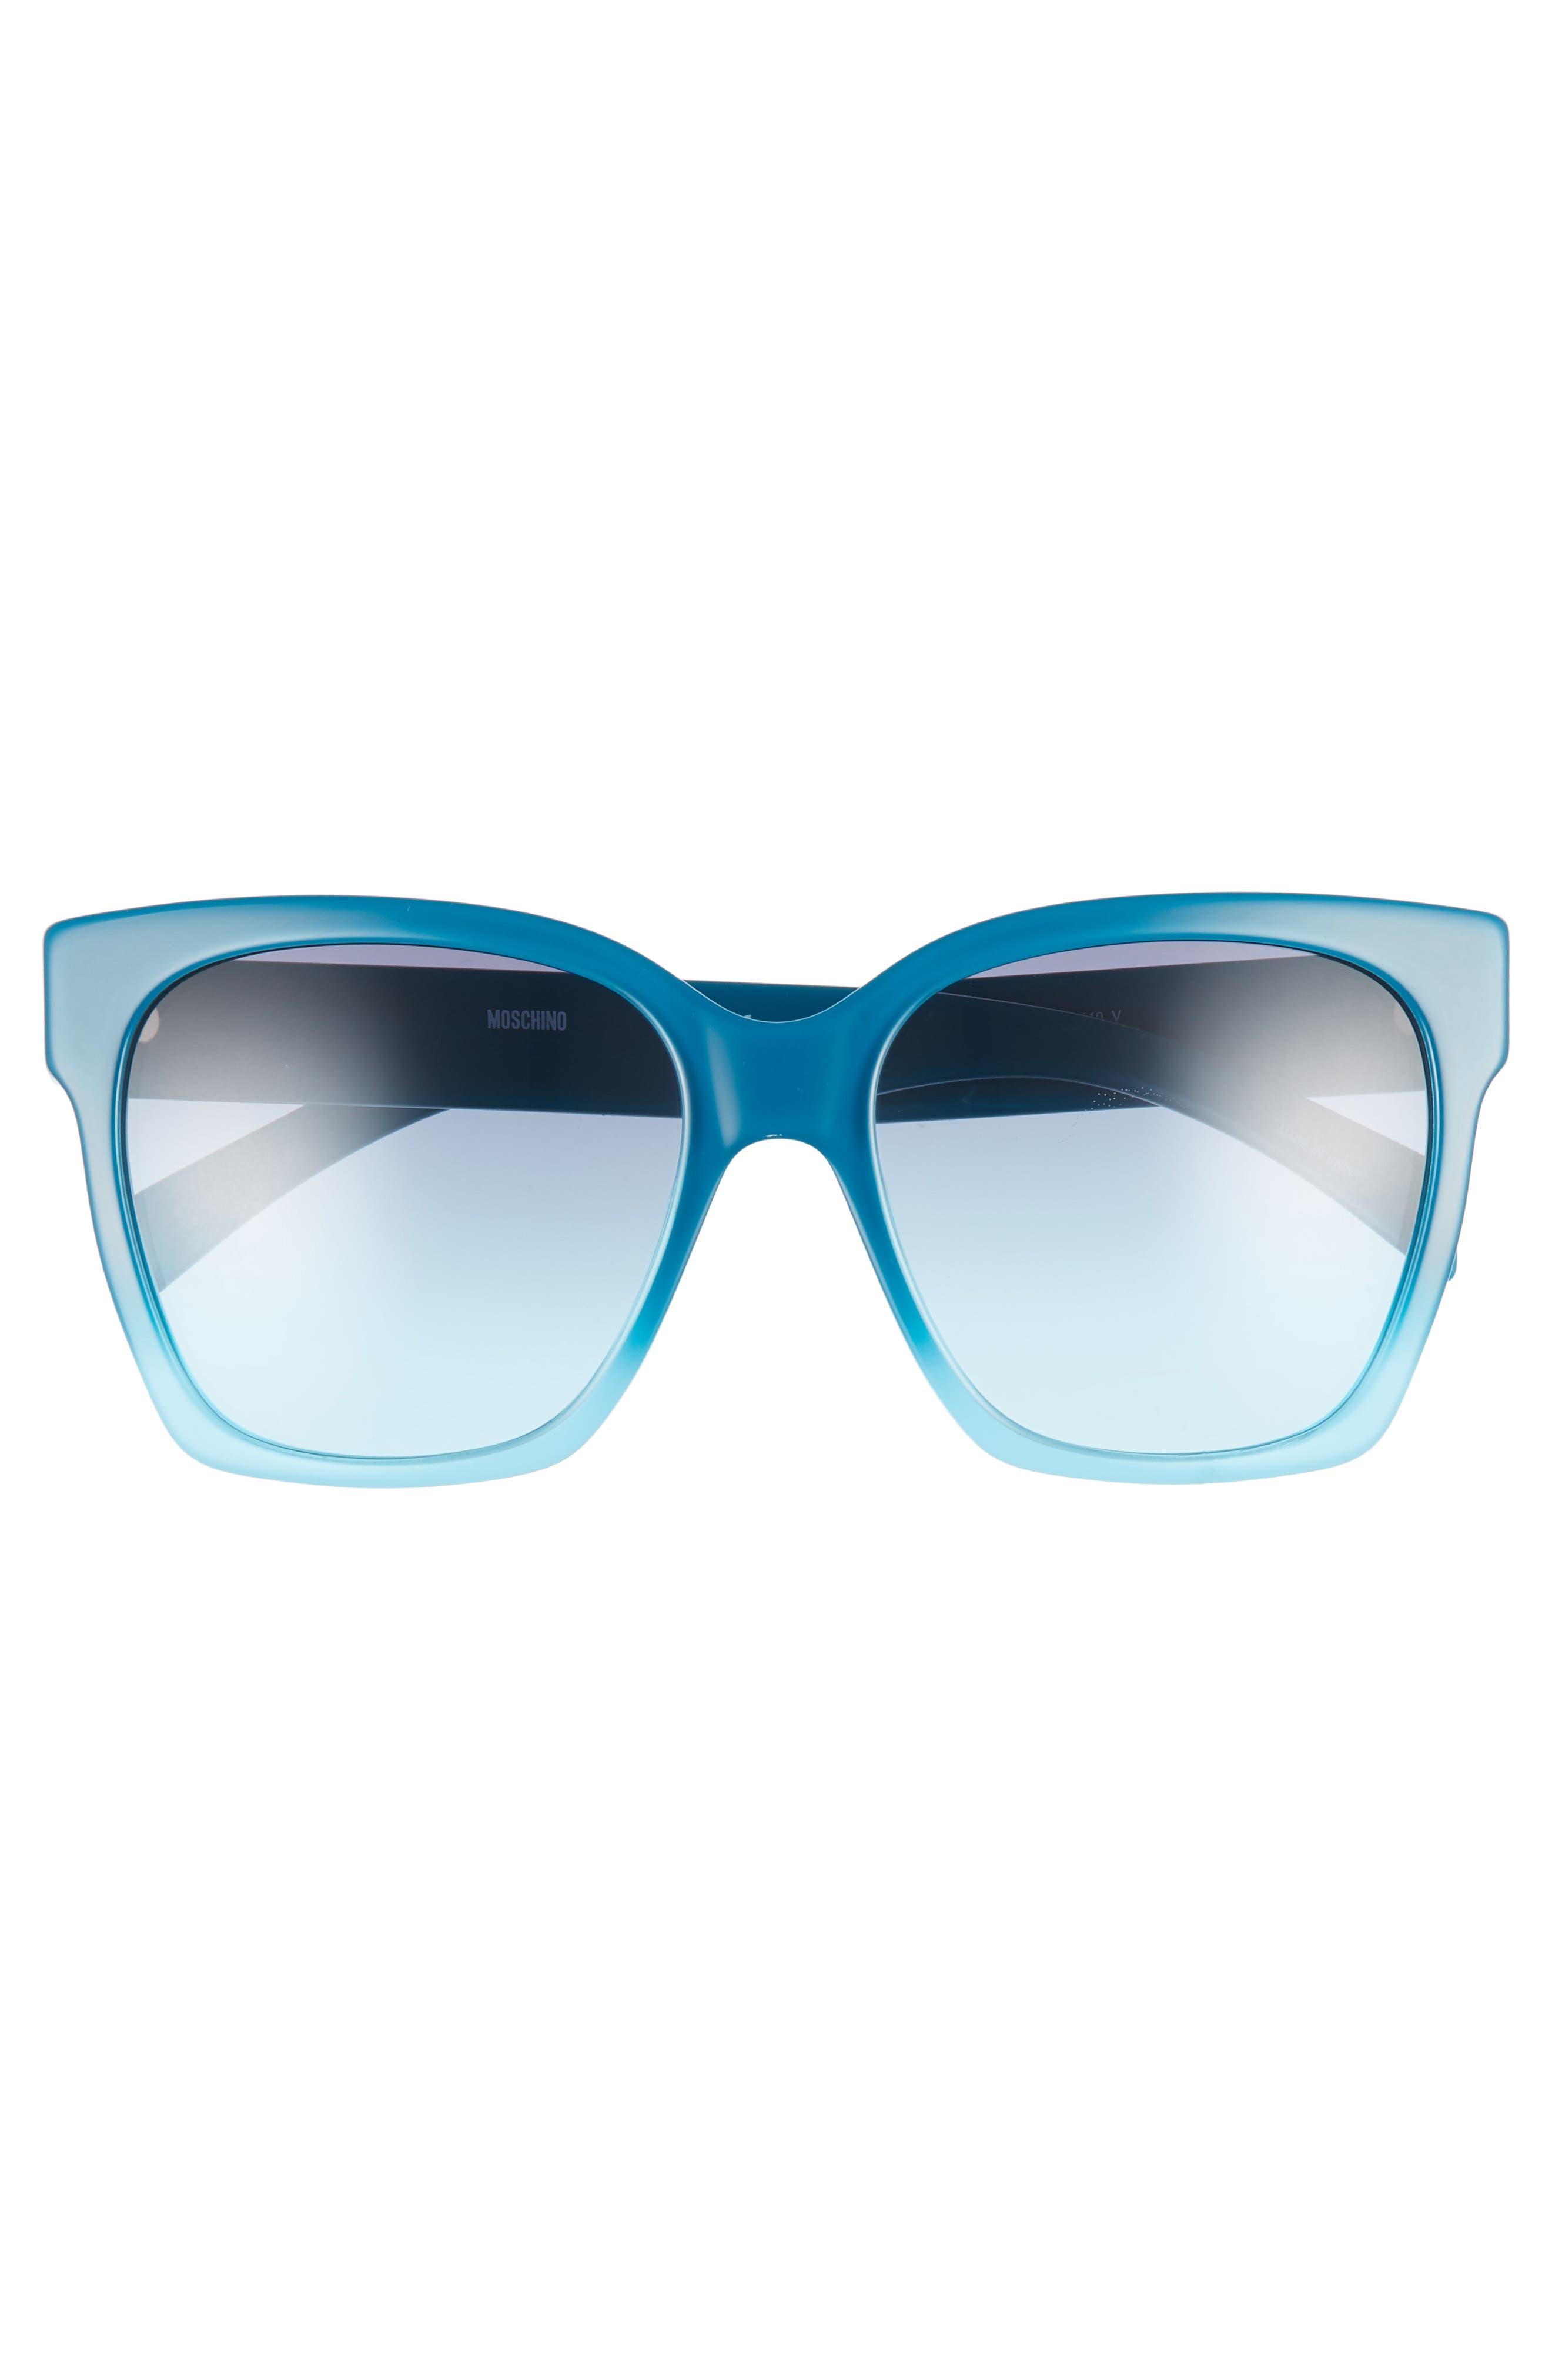 MOSCHINO, 56mm Sunglasses, Alternate thumbnail 3, color, TEAL TEA